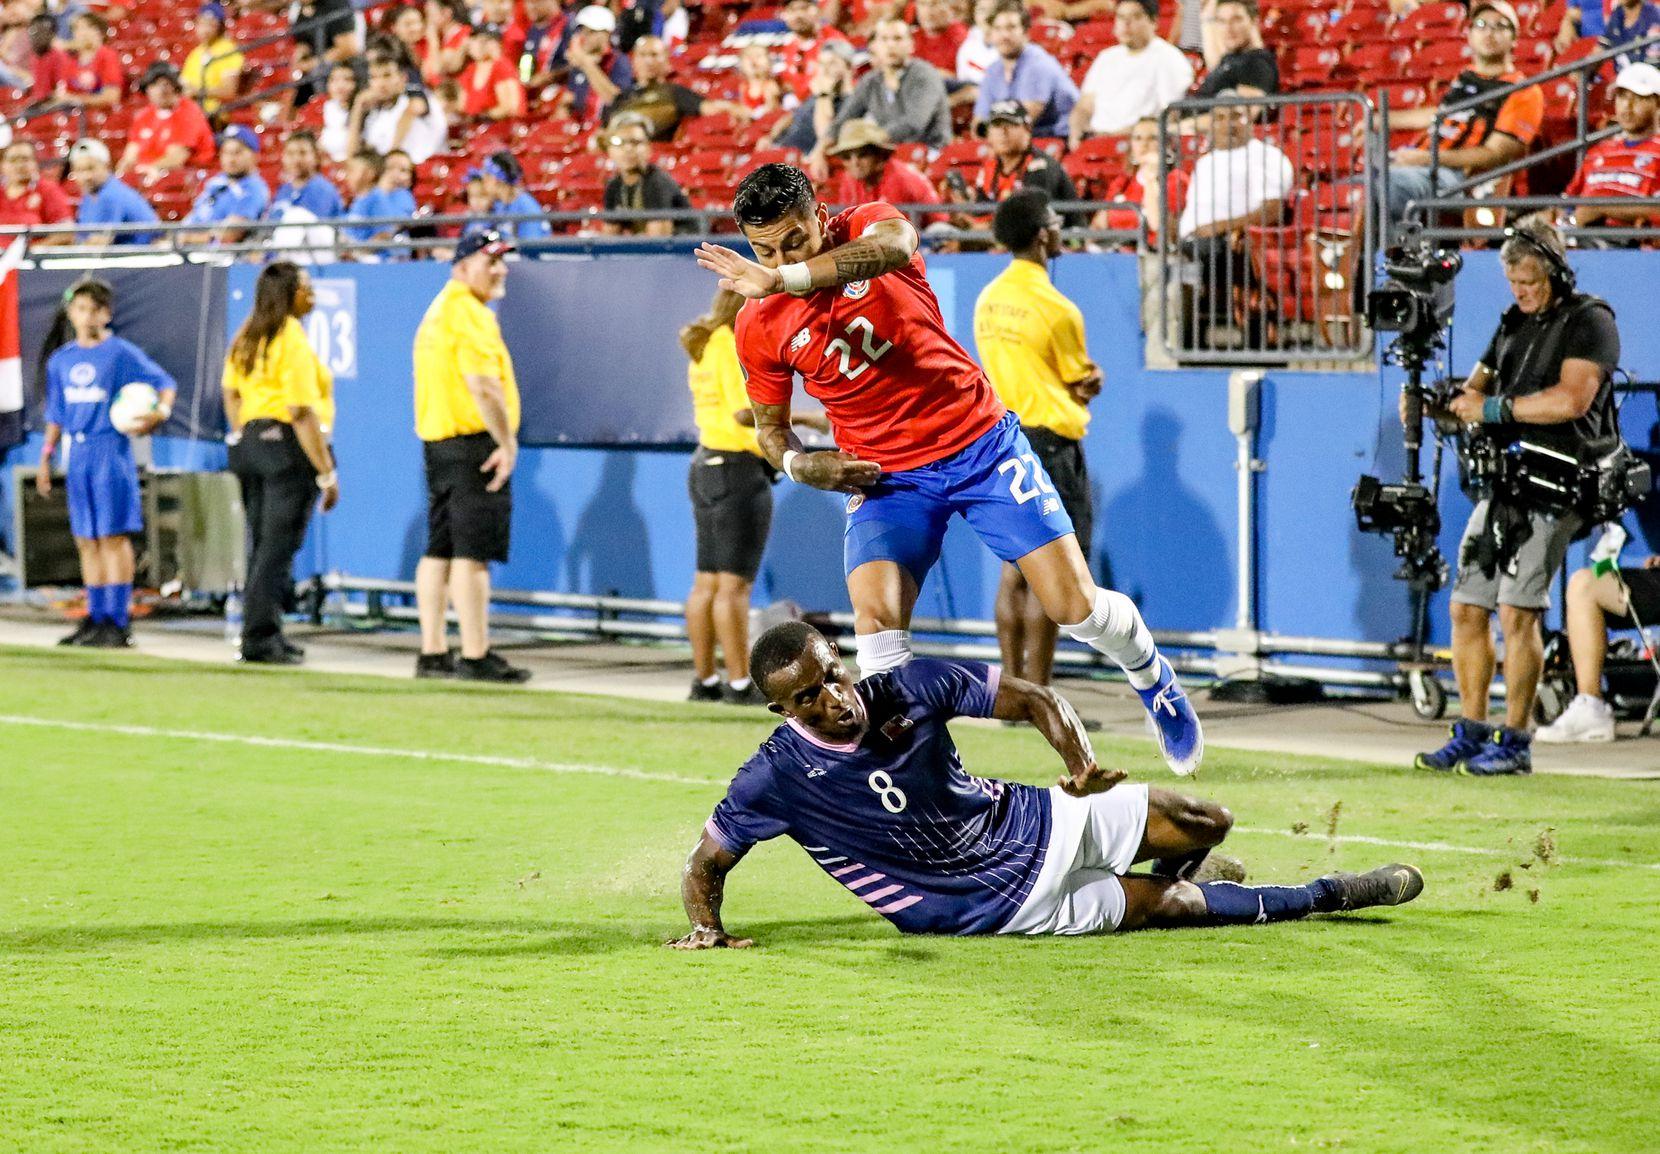 Bryan Oviedo of Bermuda tackles Costa Rica's Ronald Matarrita in the 2019 Gold Cup at Toyota Stadium. (6-20-19)